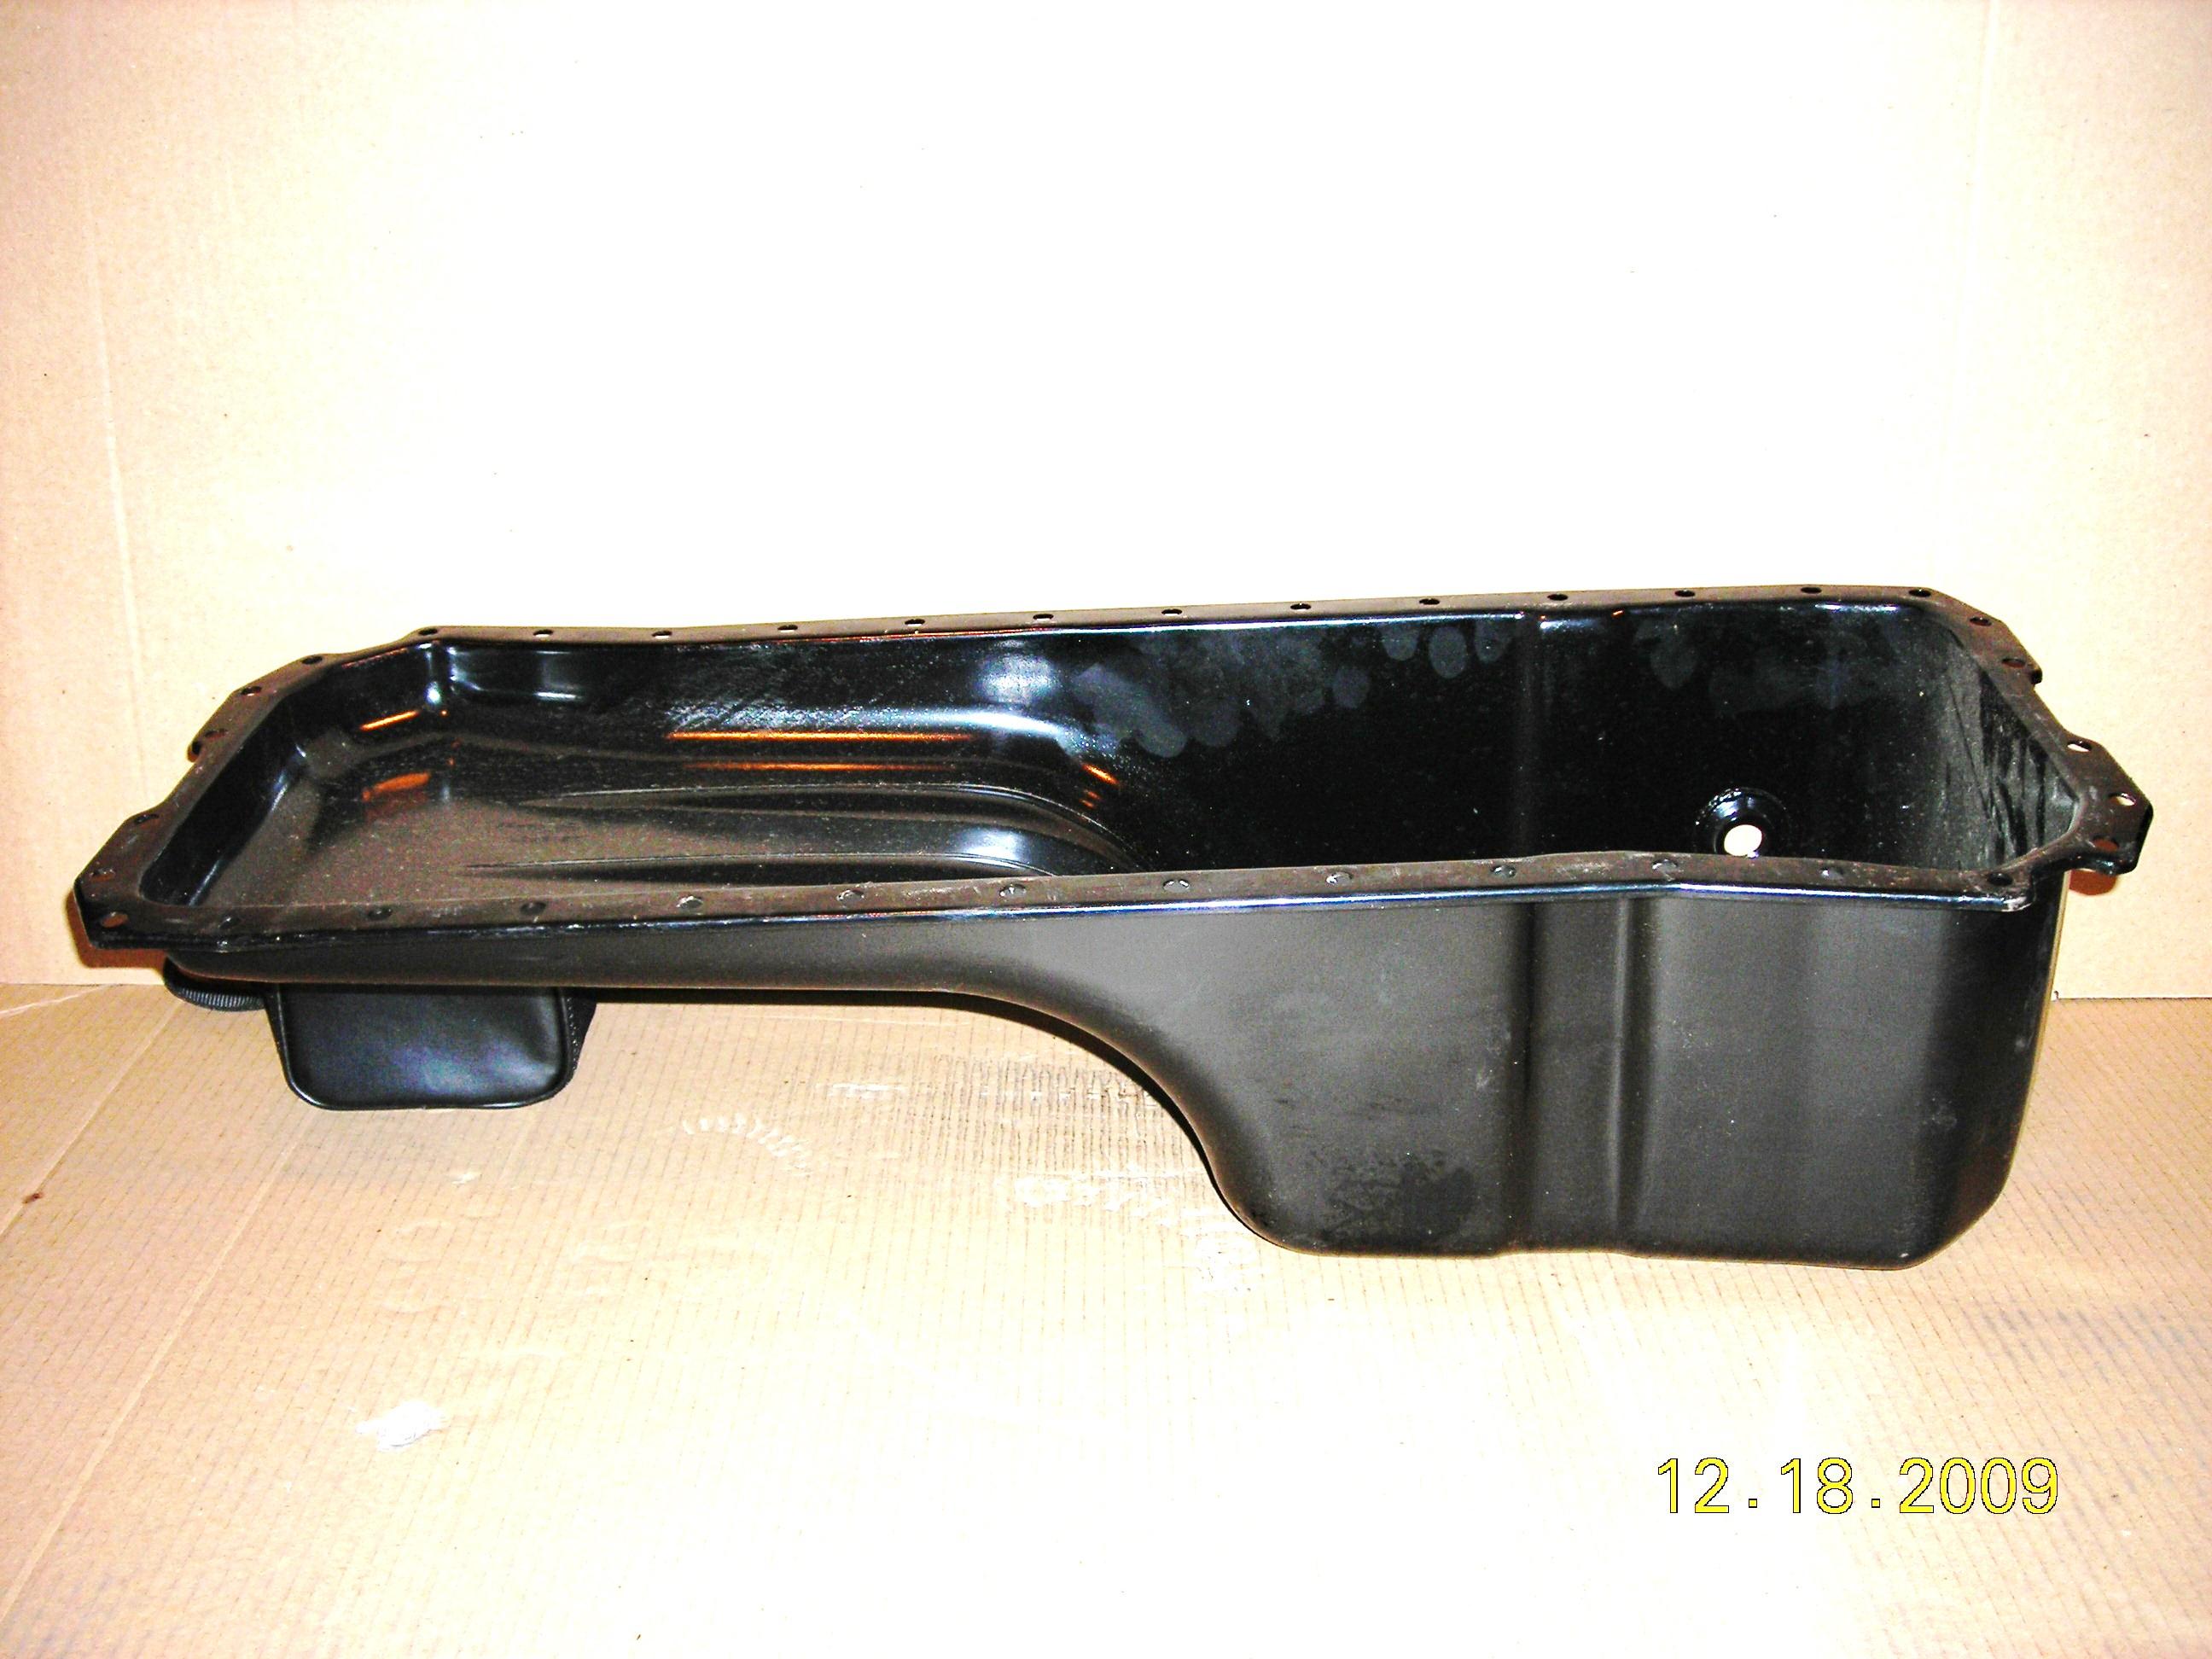 3915703 Cummins Oil Pan - View #2